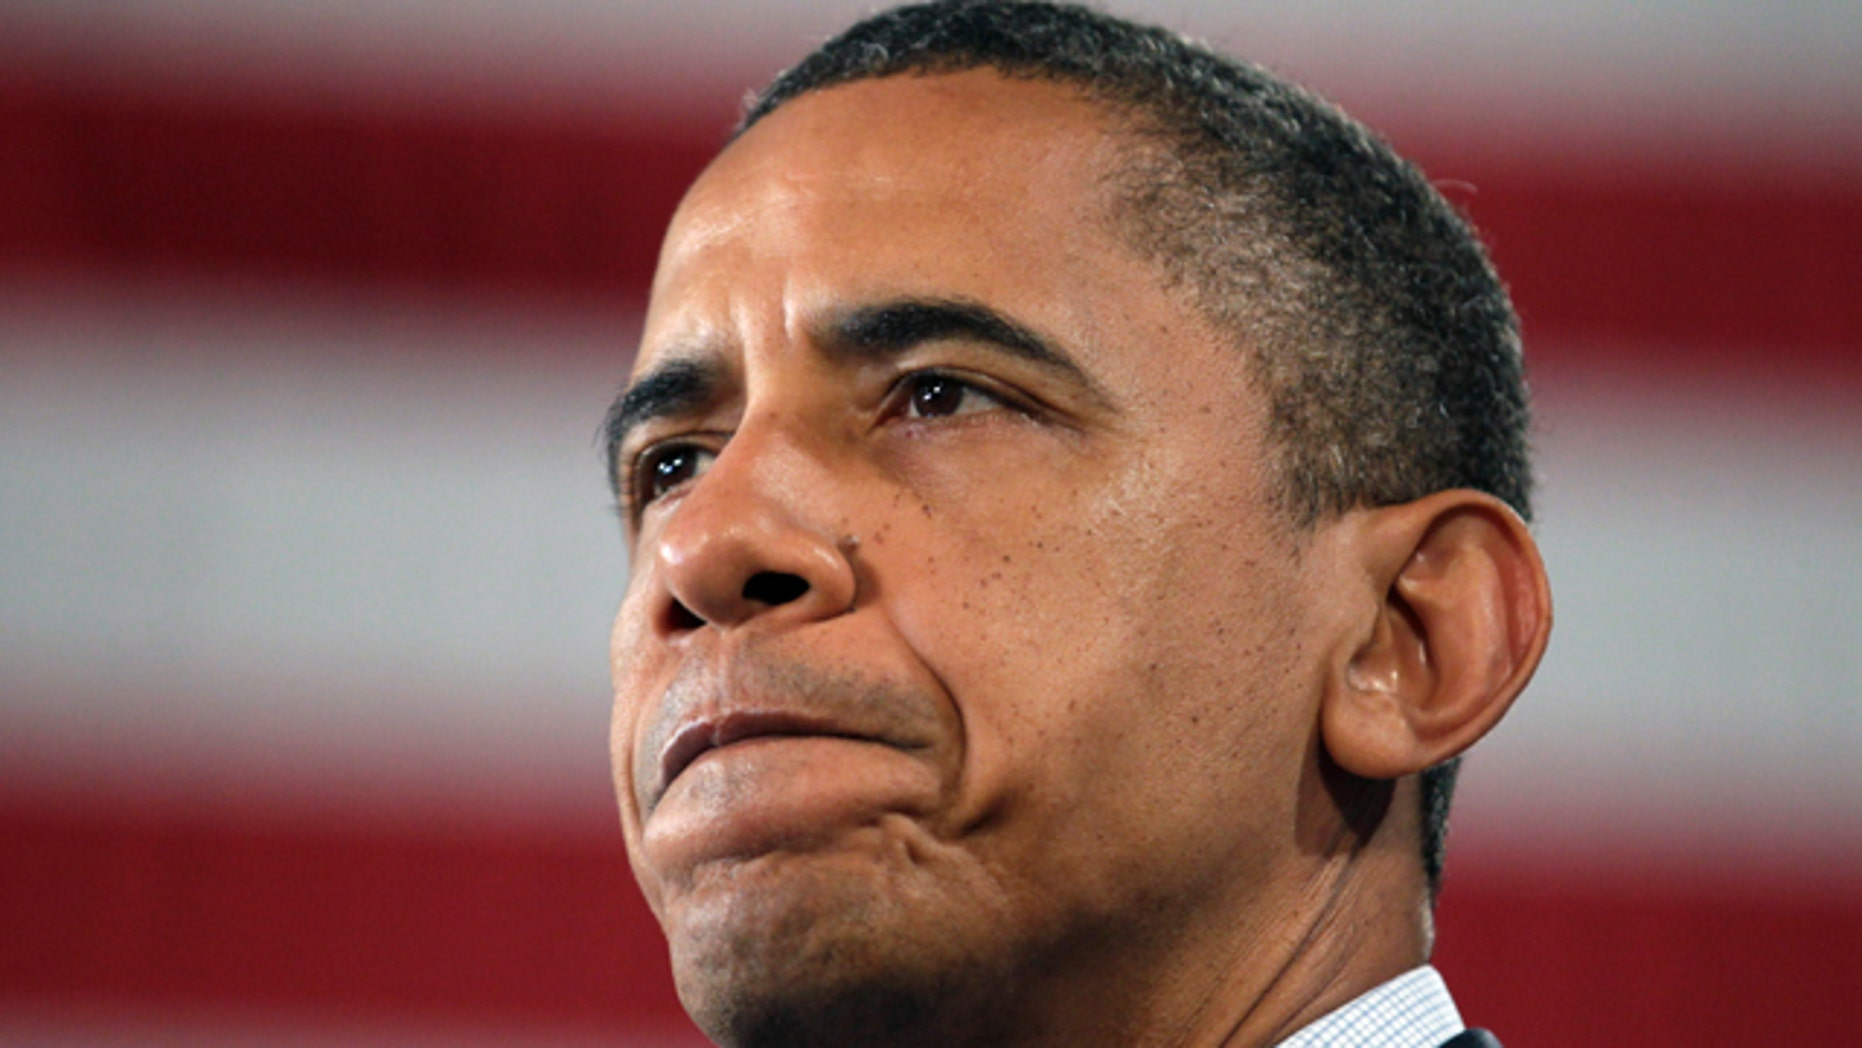 August 16: President Obama